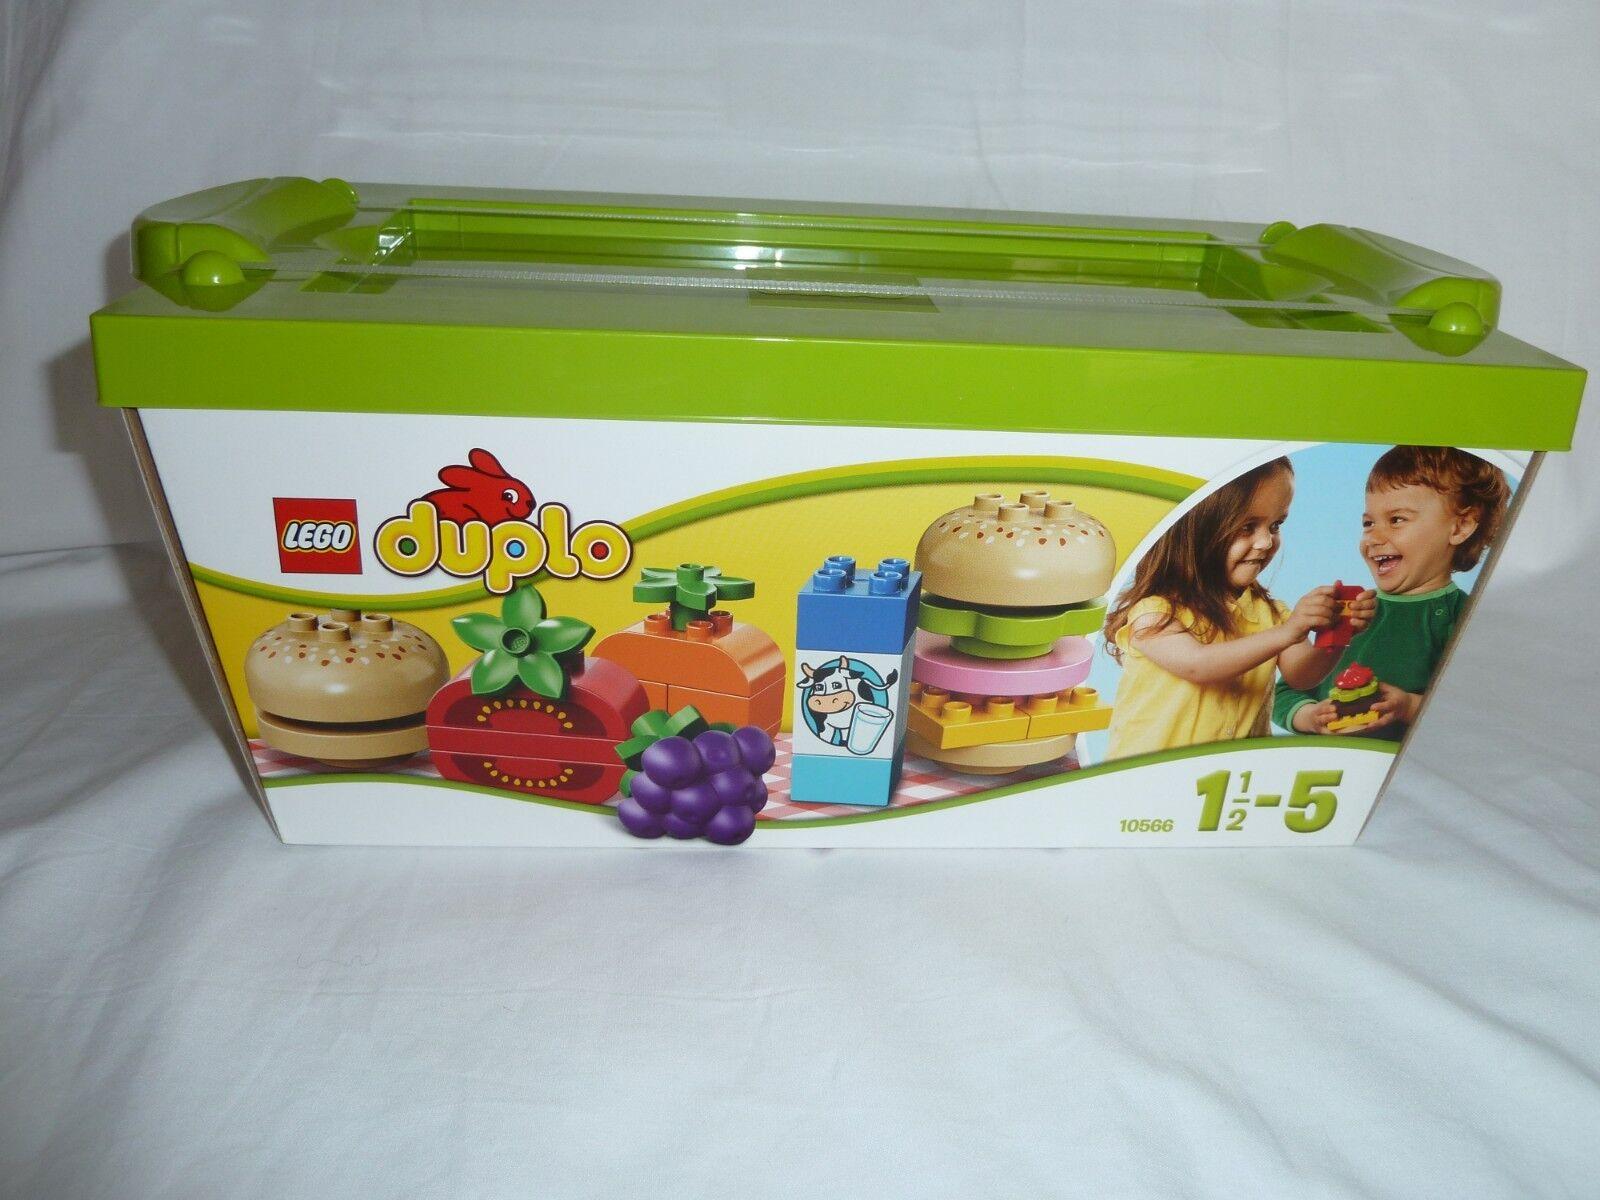 Lego Duplo  10566 Creative Picnic  - BNISB